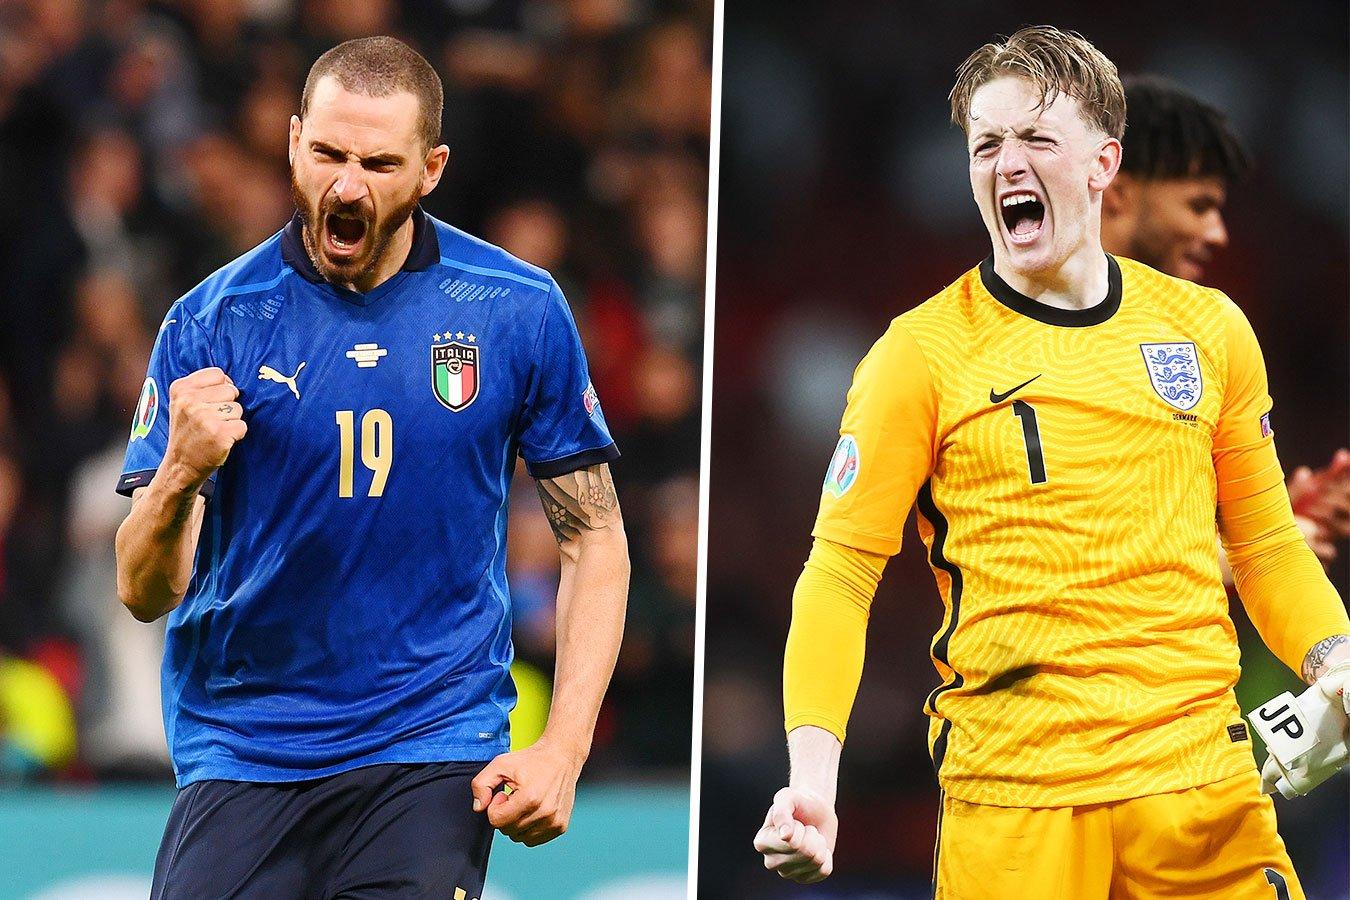 Италия — Англия: прямая трансляция матча Евро-2020 на канале «Россия 1»